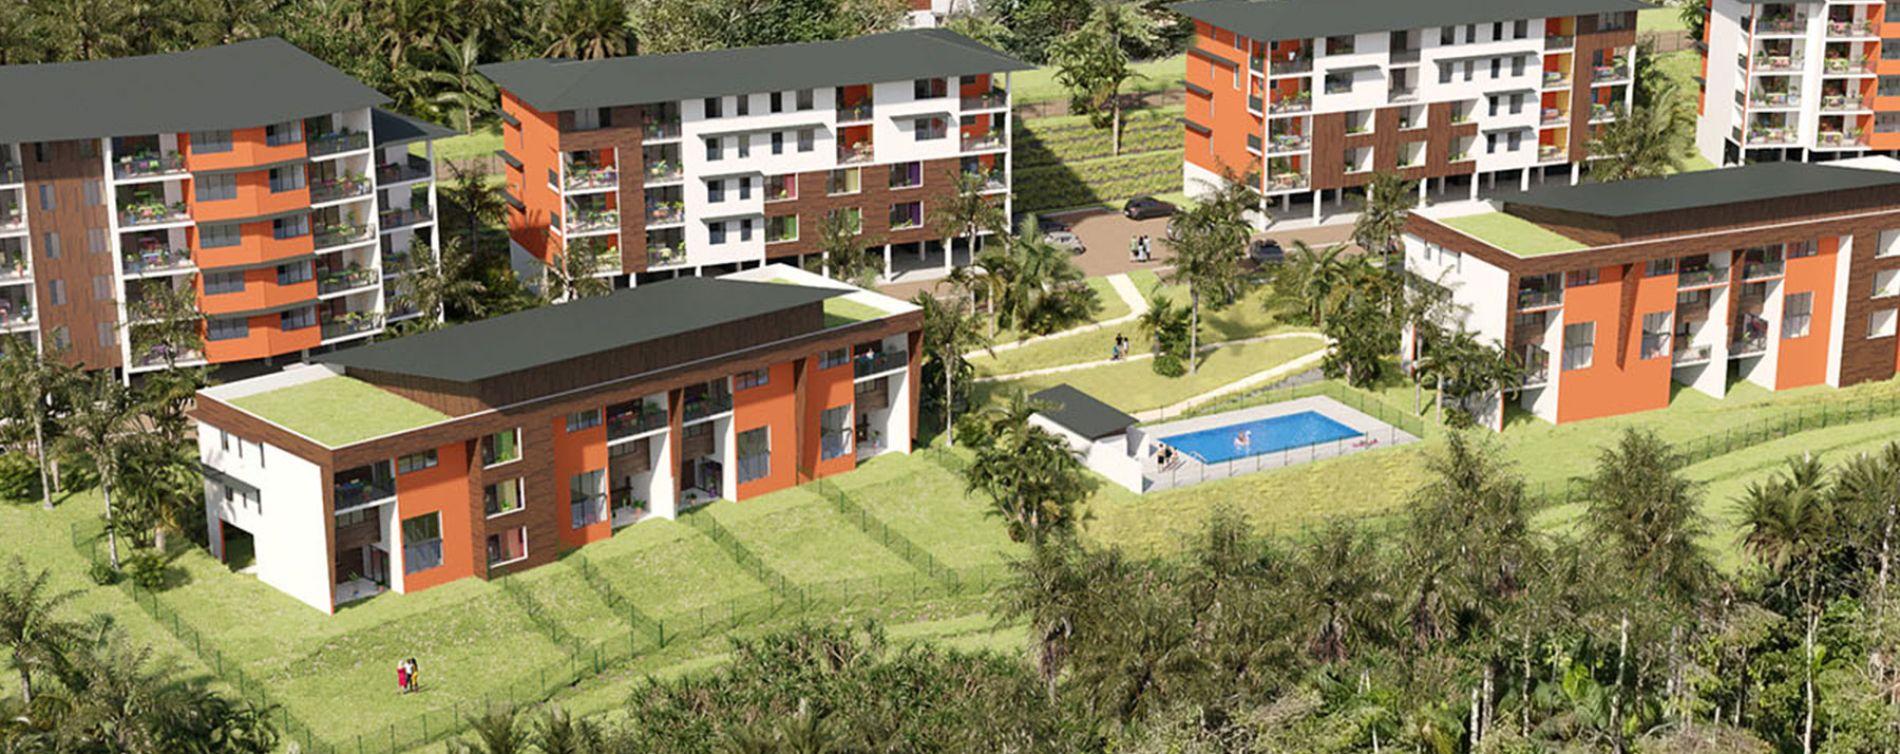 Remire-Montjoly : programme immobilier neuve « Ebène Rose 2022 » en Loi Pinel